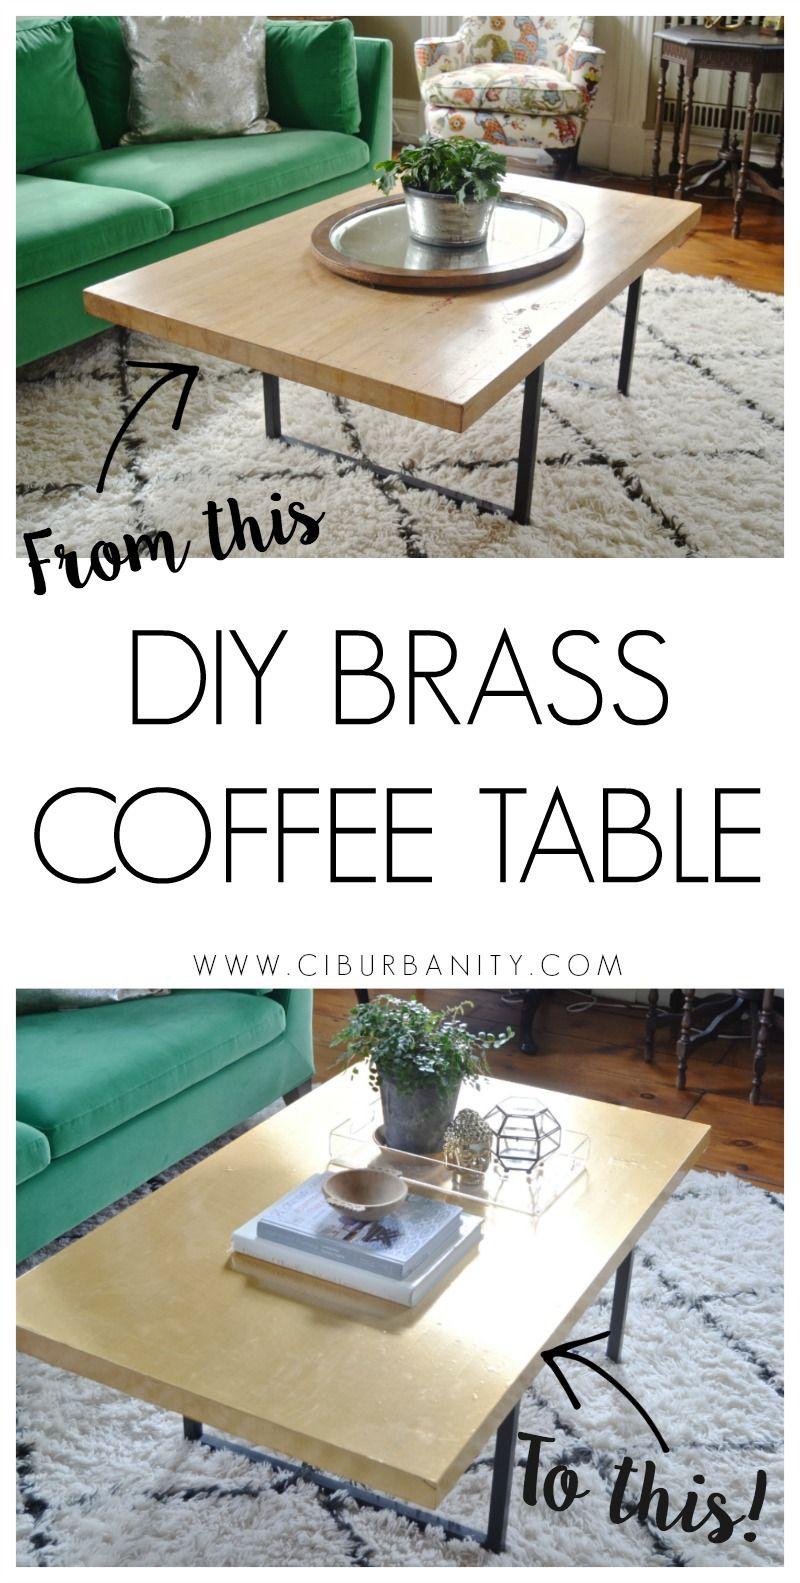 DIY Brass Coffee Table | Craft, Funky junk and DIY tutorial